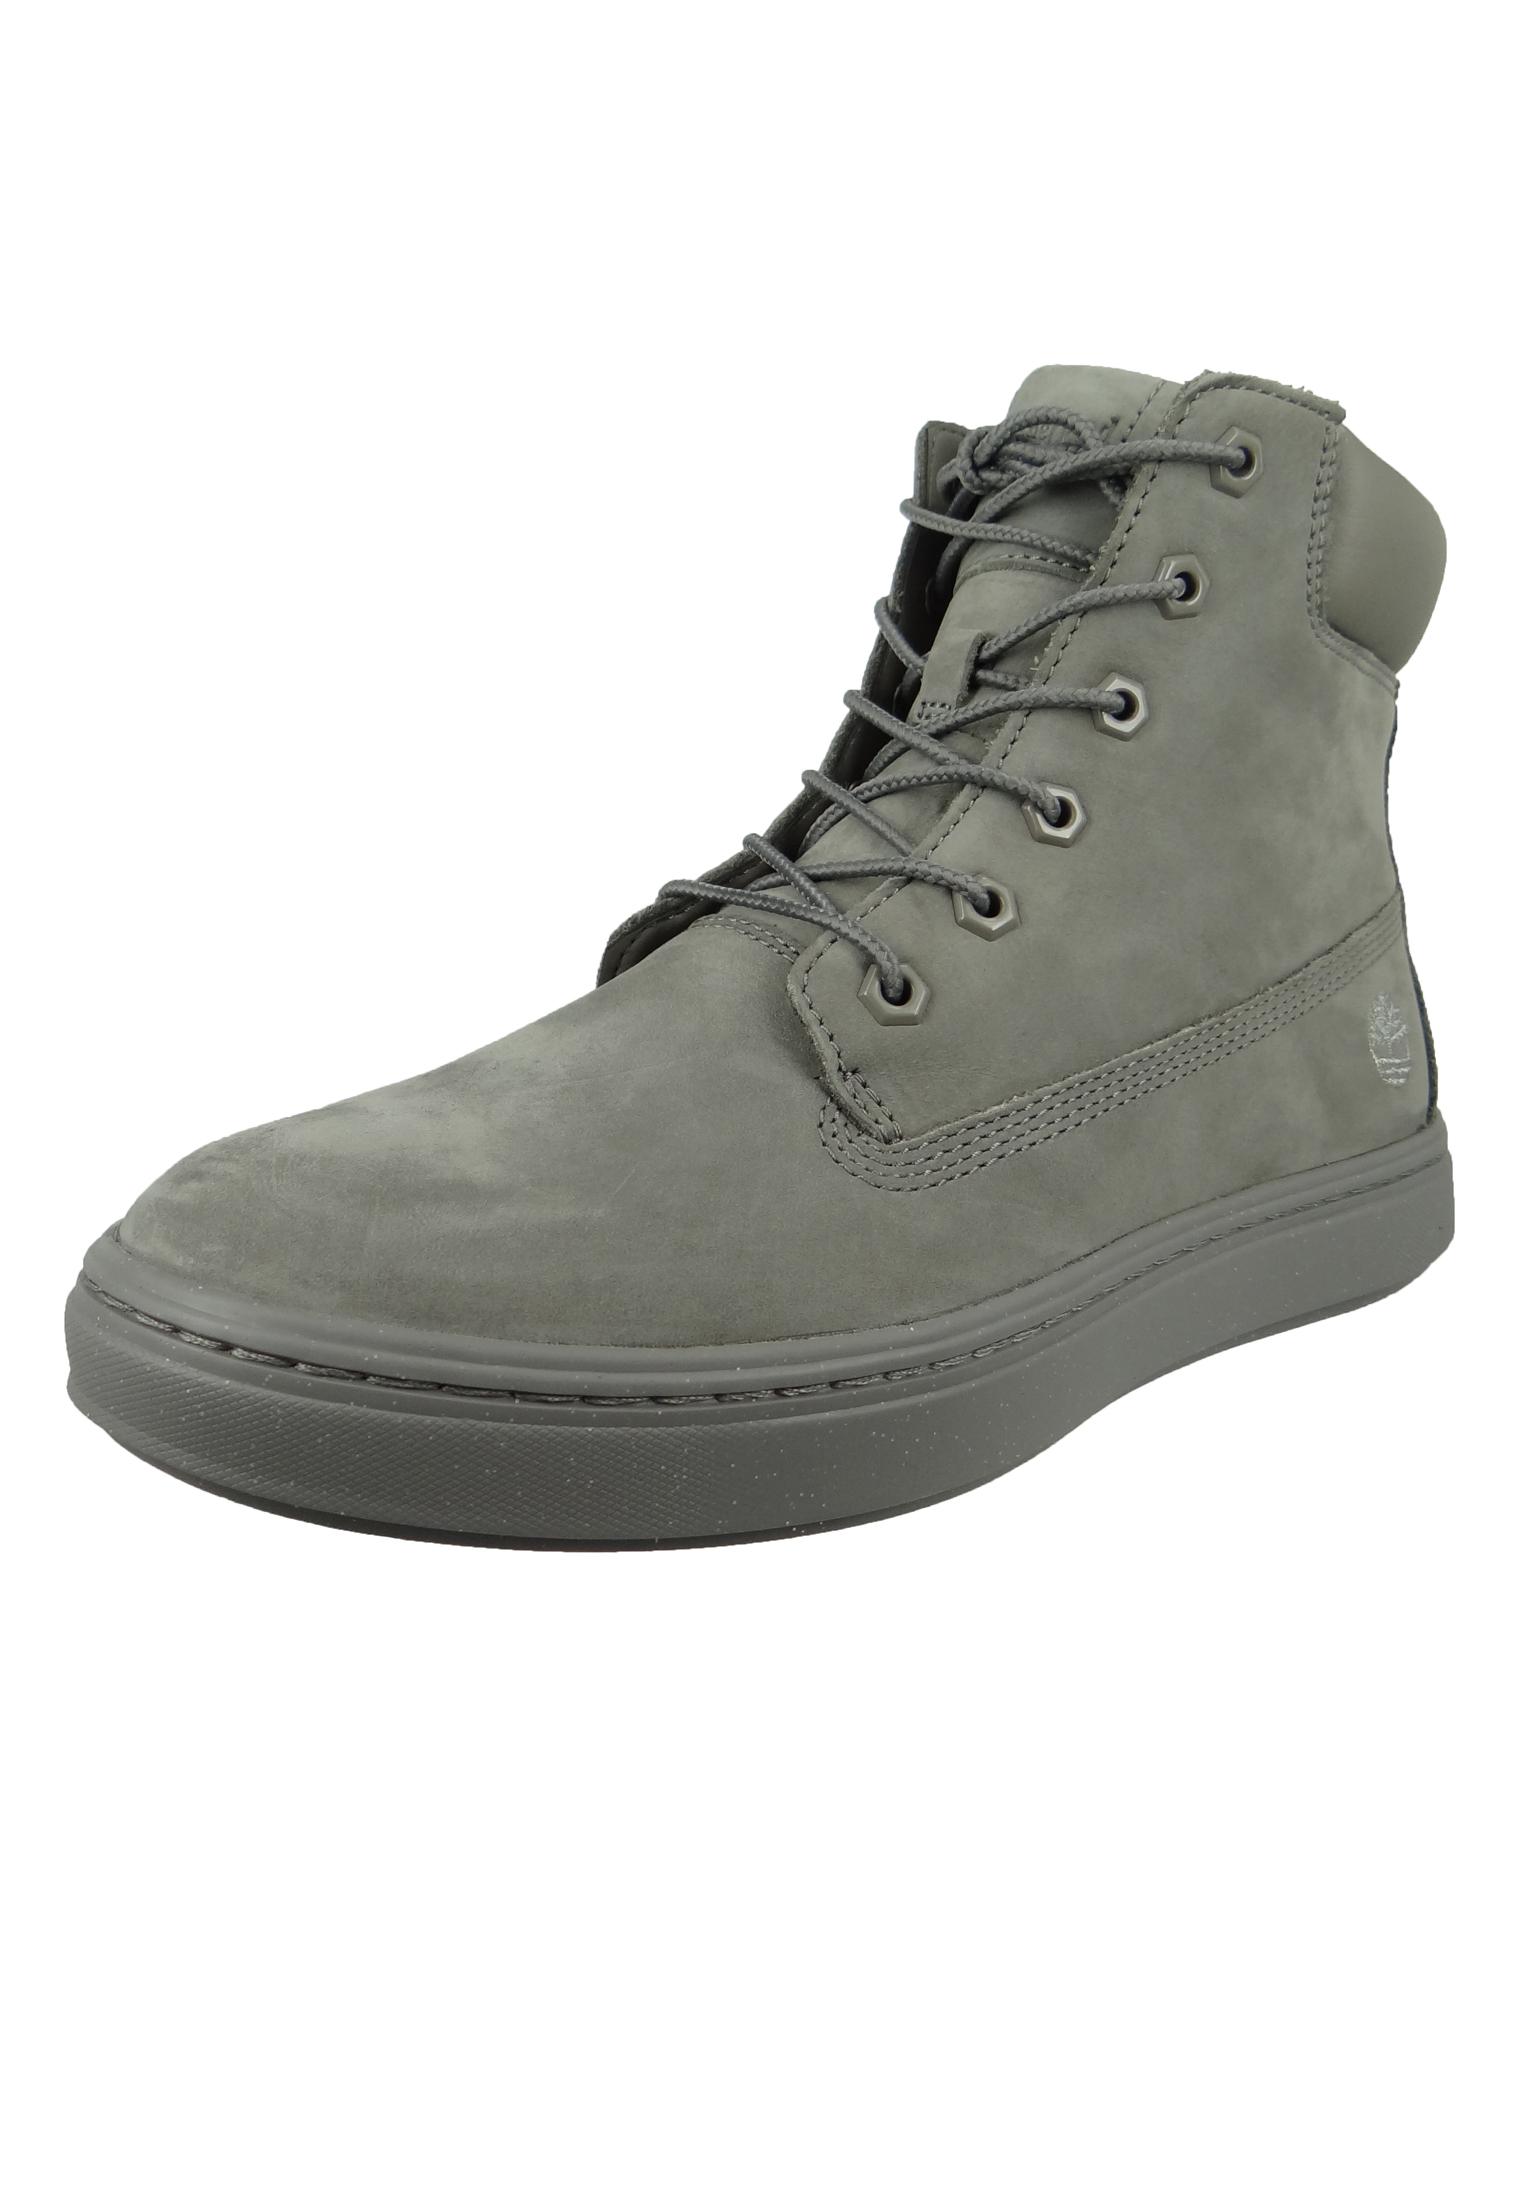 am besten bewertet neuesten komplettes Angebot an Artikeln spottbillig Timberland Damen Sneaker Boot A1R6P Londyn 6Inch Grau Steeple Grey